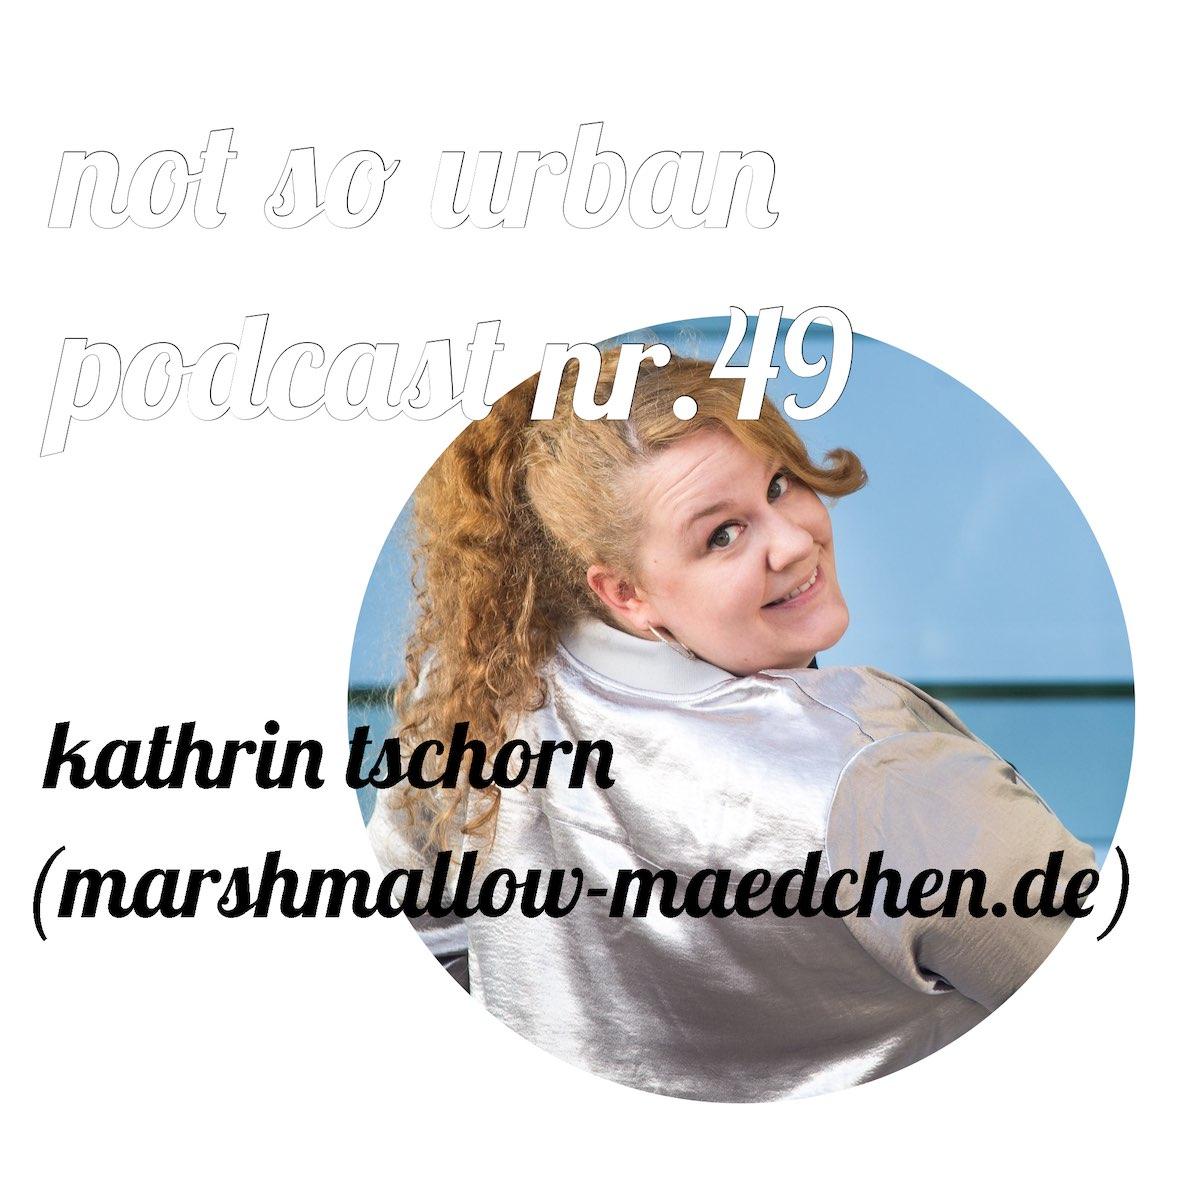 not so urban Podcast Nr.49: Kathrin Tschorn (marshmallow-maedchen.de) (Cover)